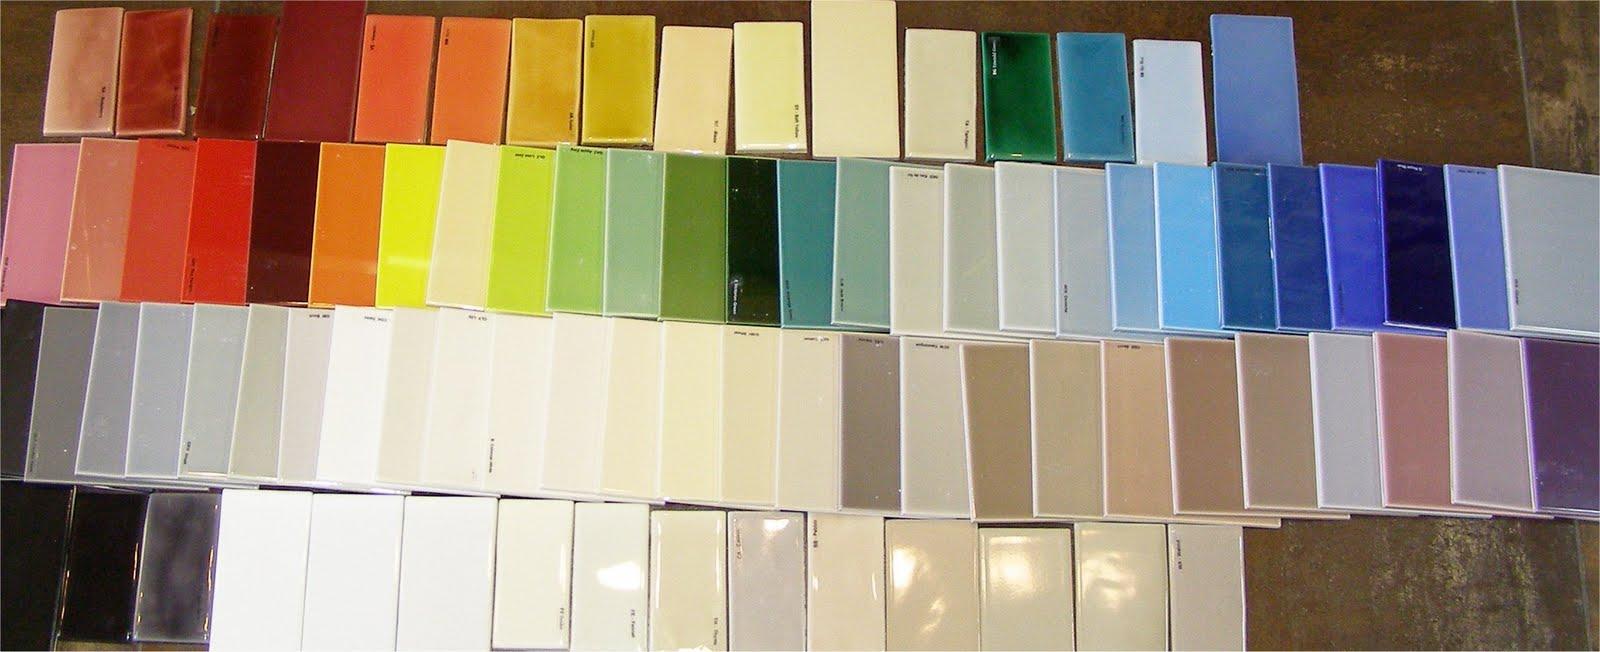 H.Winter Showroom Blog: Miles of Tile: Subway Tile